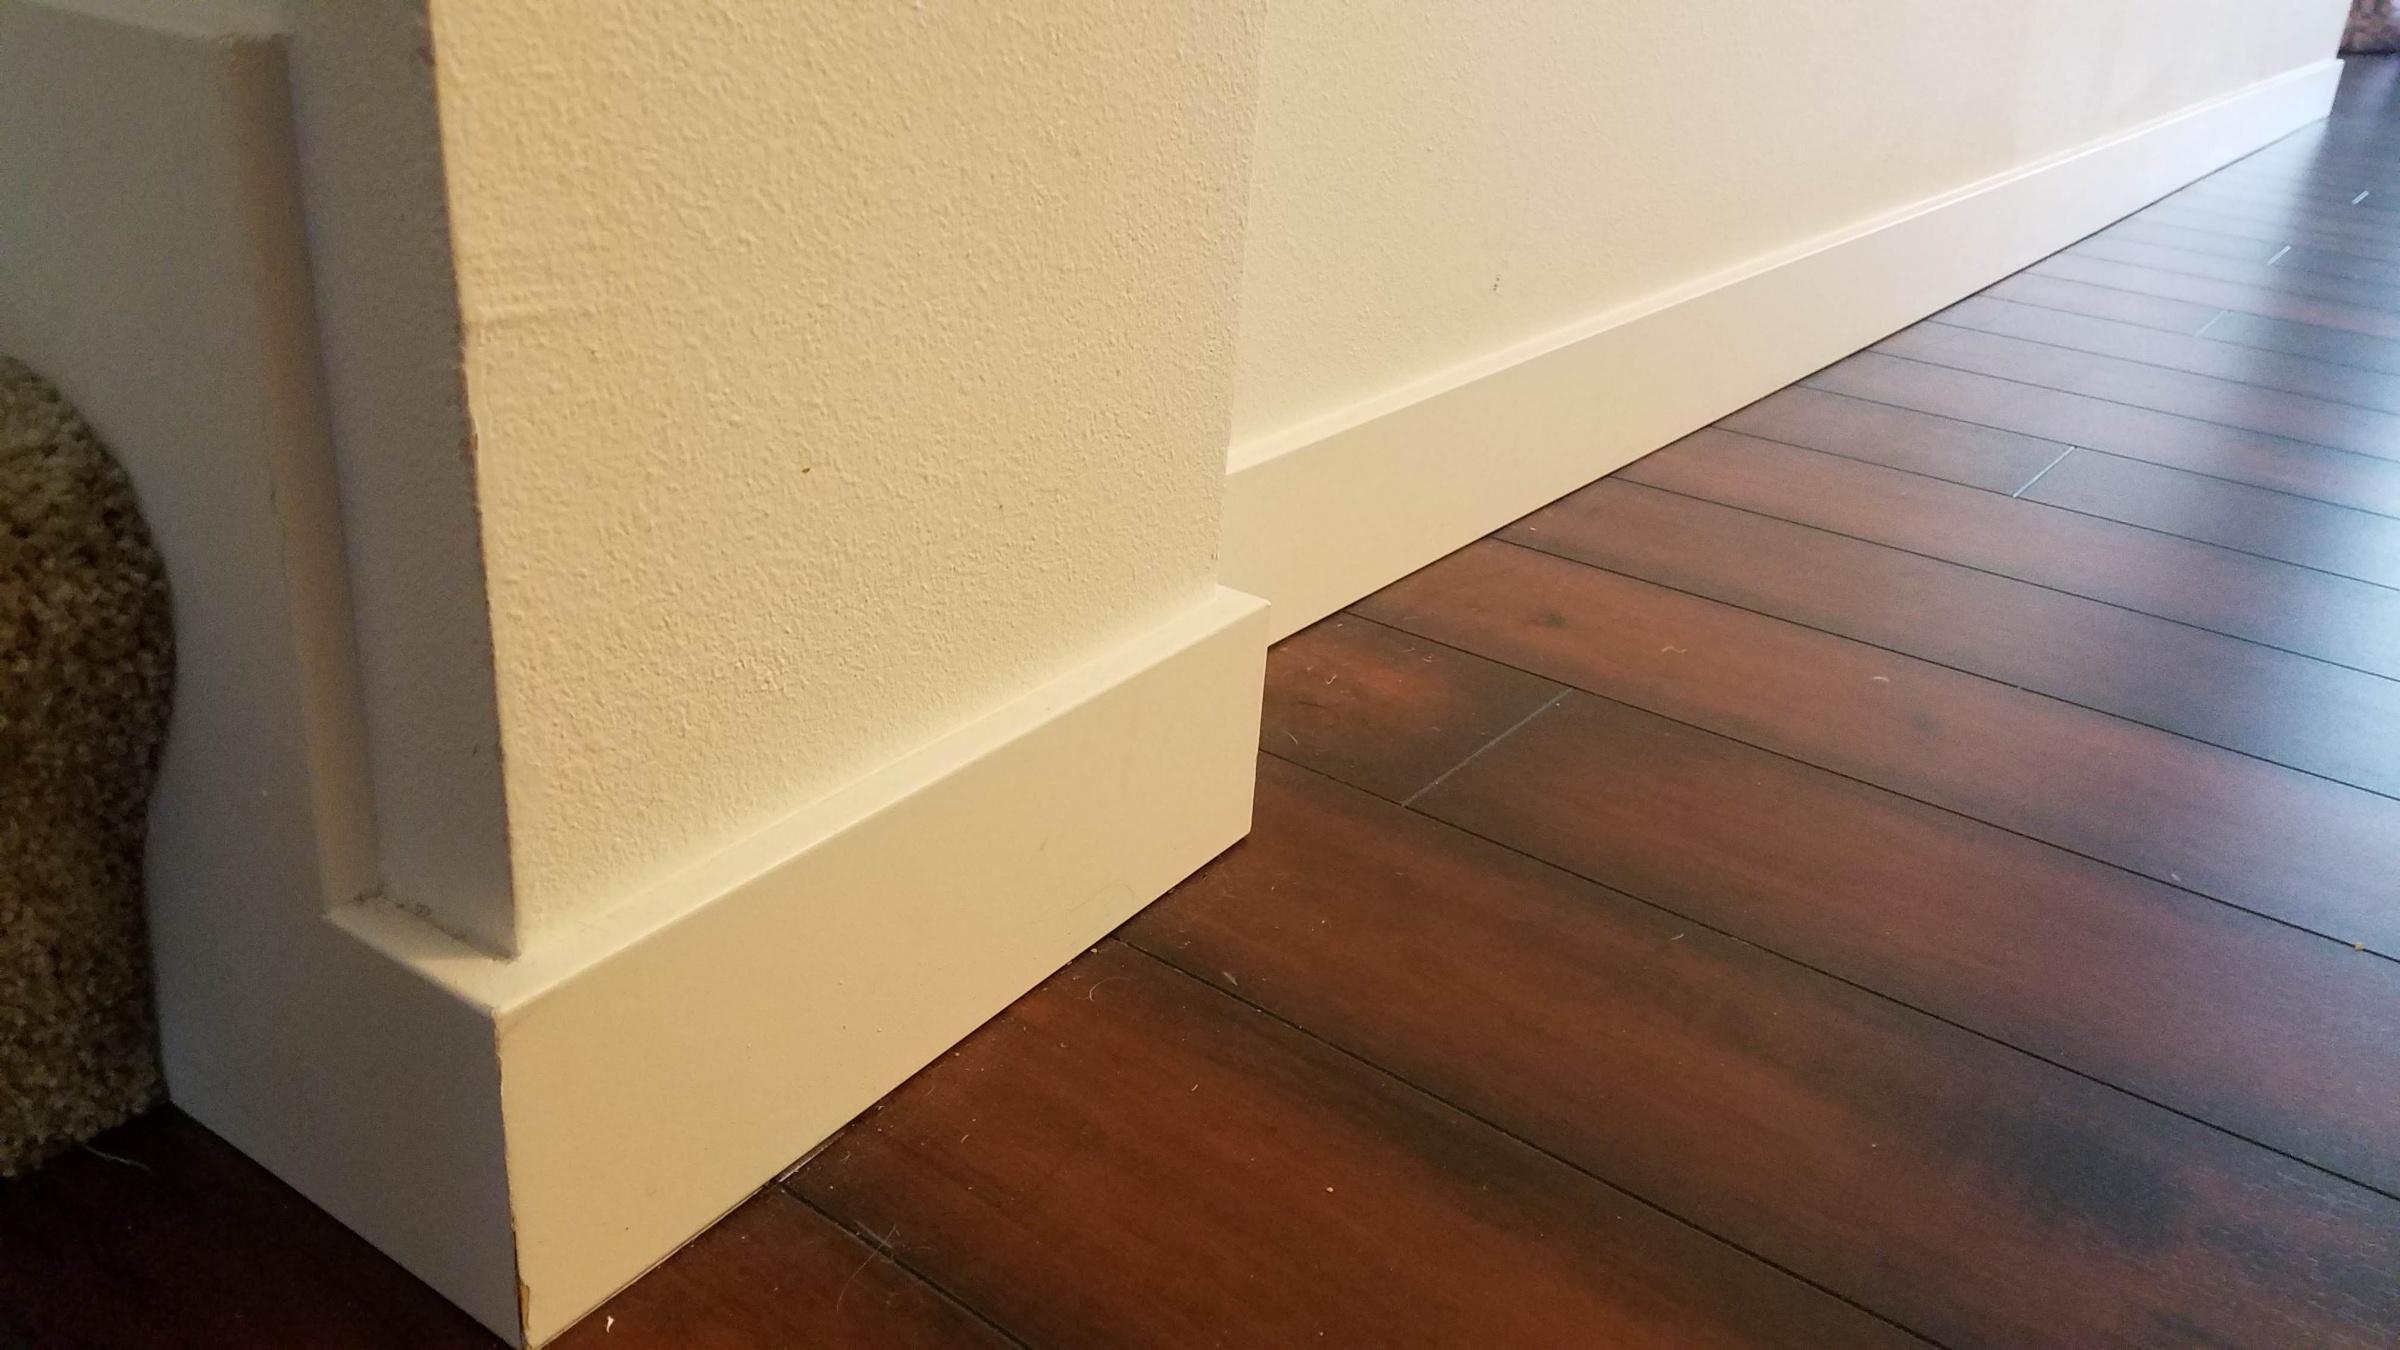 Base Molding MDF or wood? buy or cut?-20181025_114159.jpg